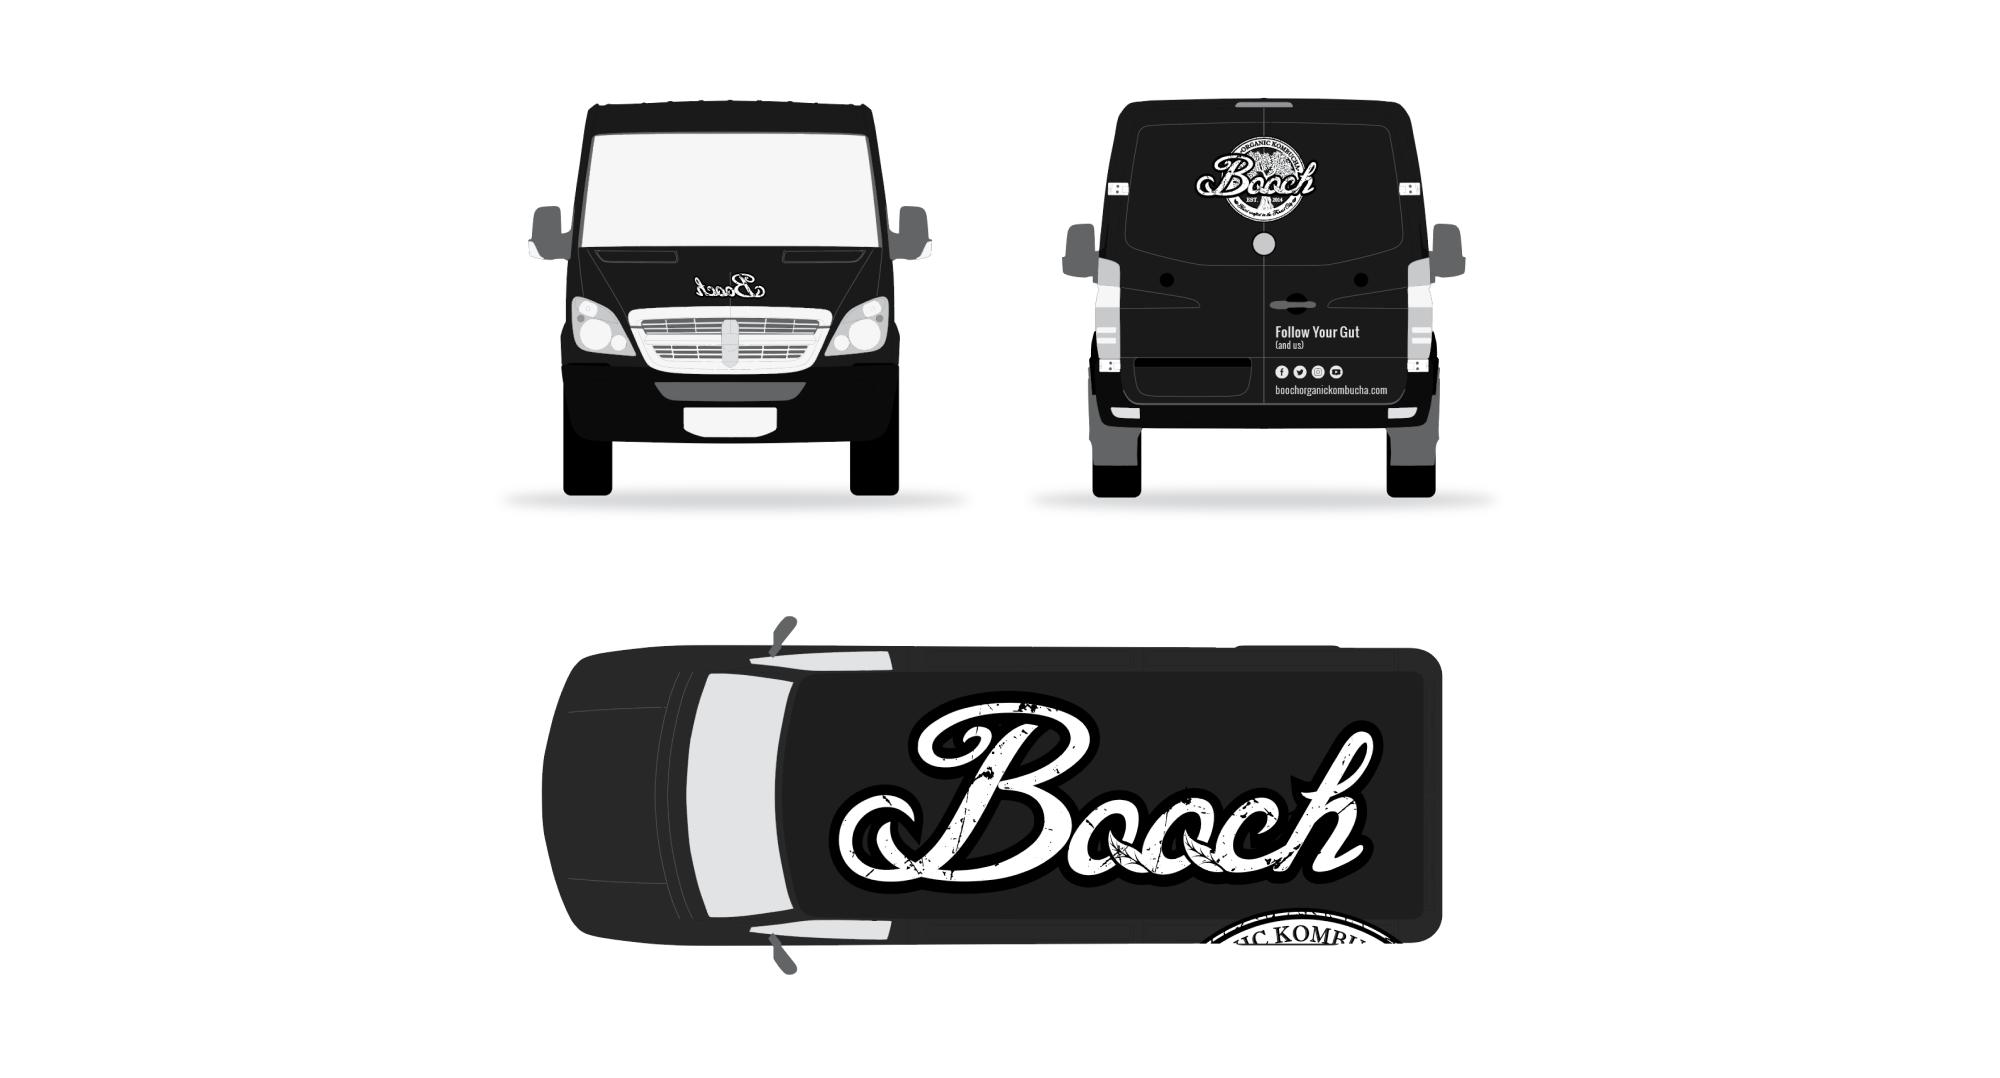 Three view of black van with white Booch logo